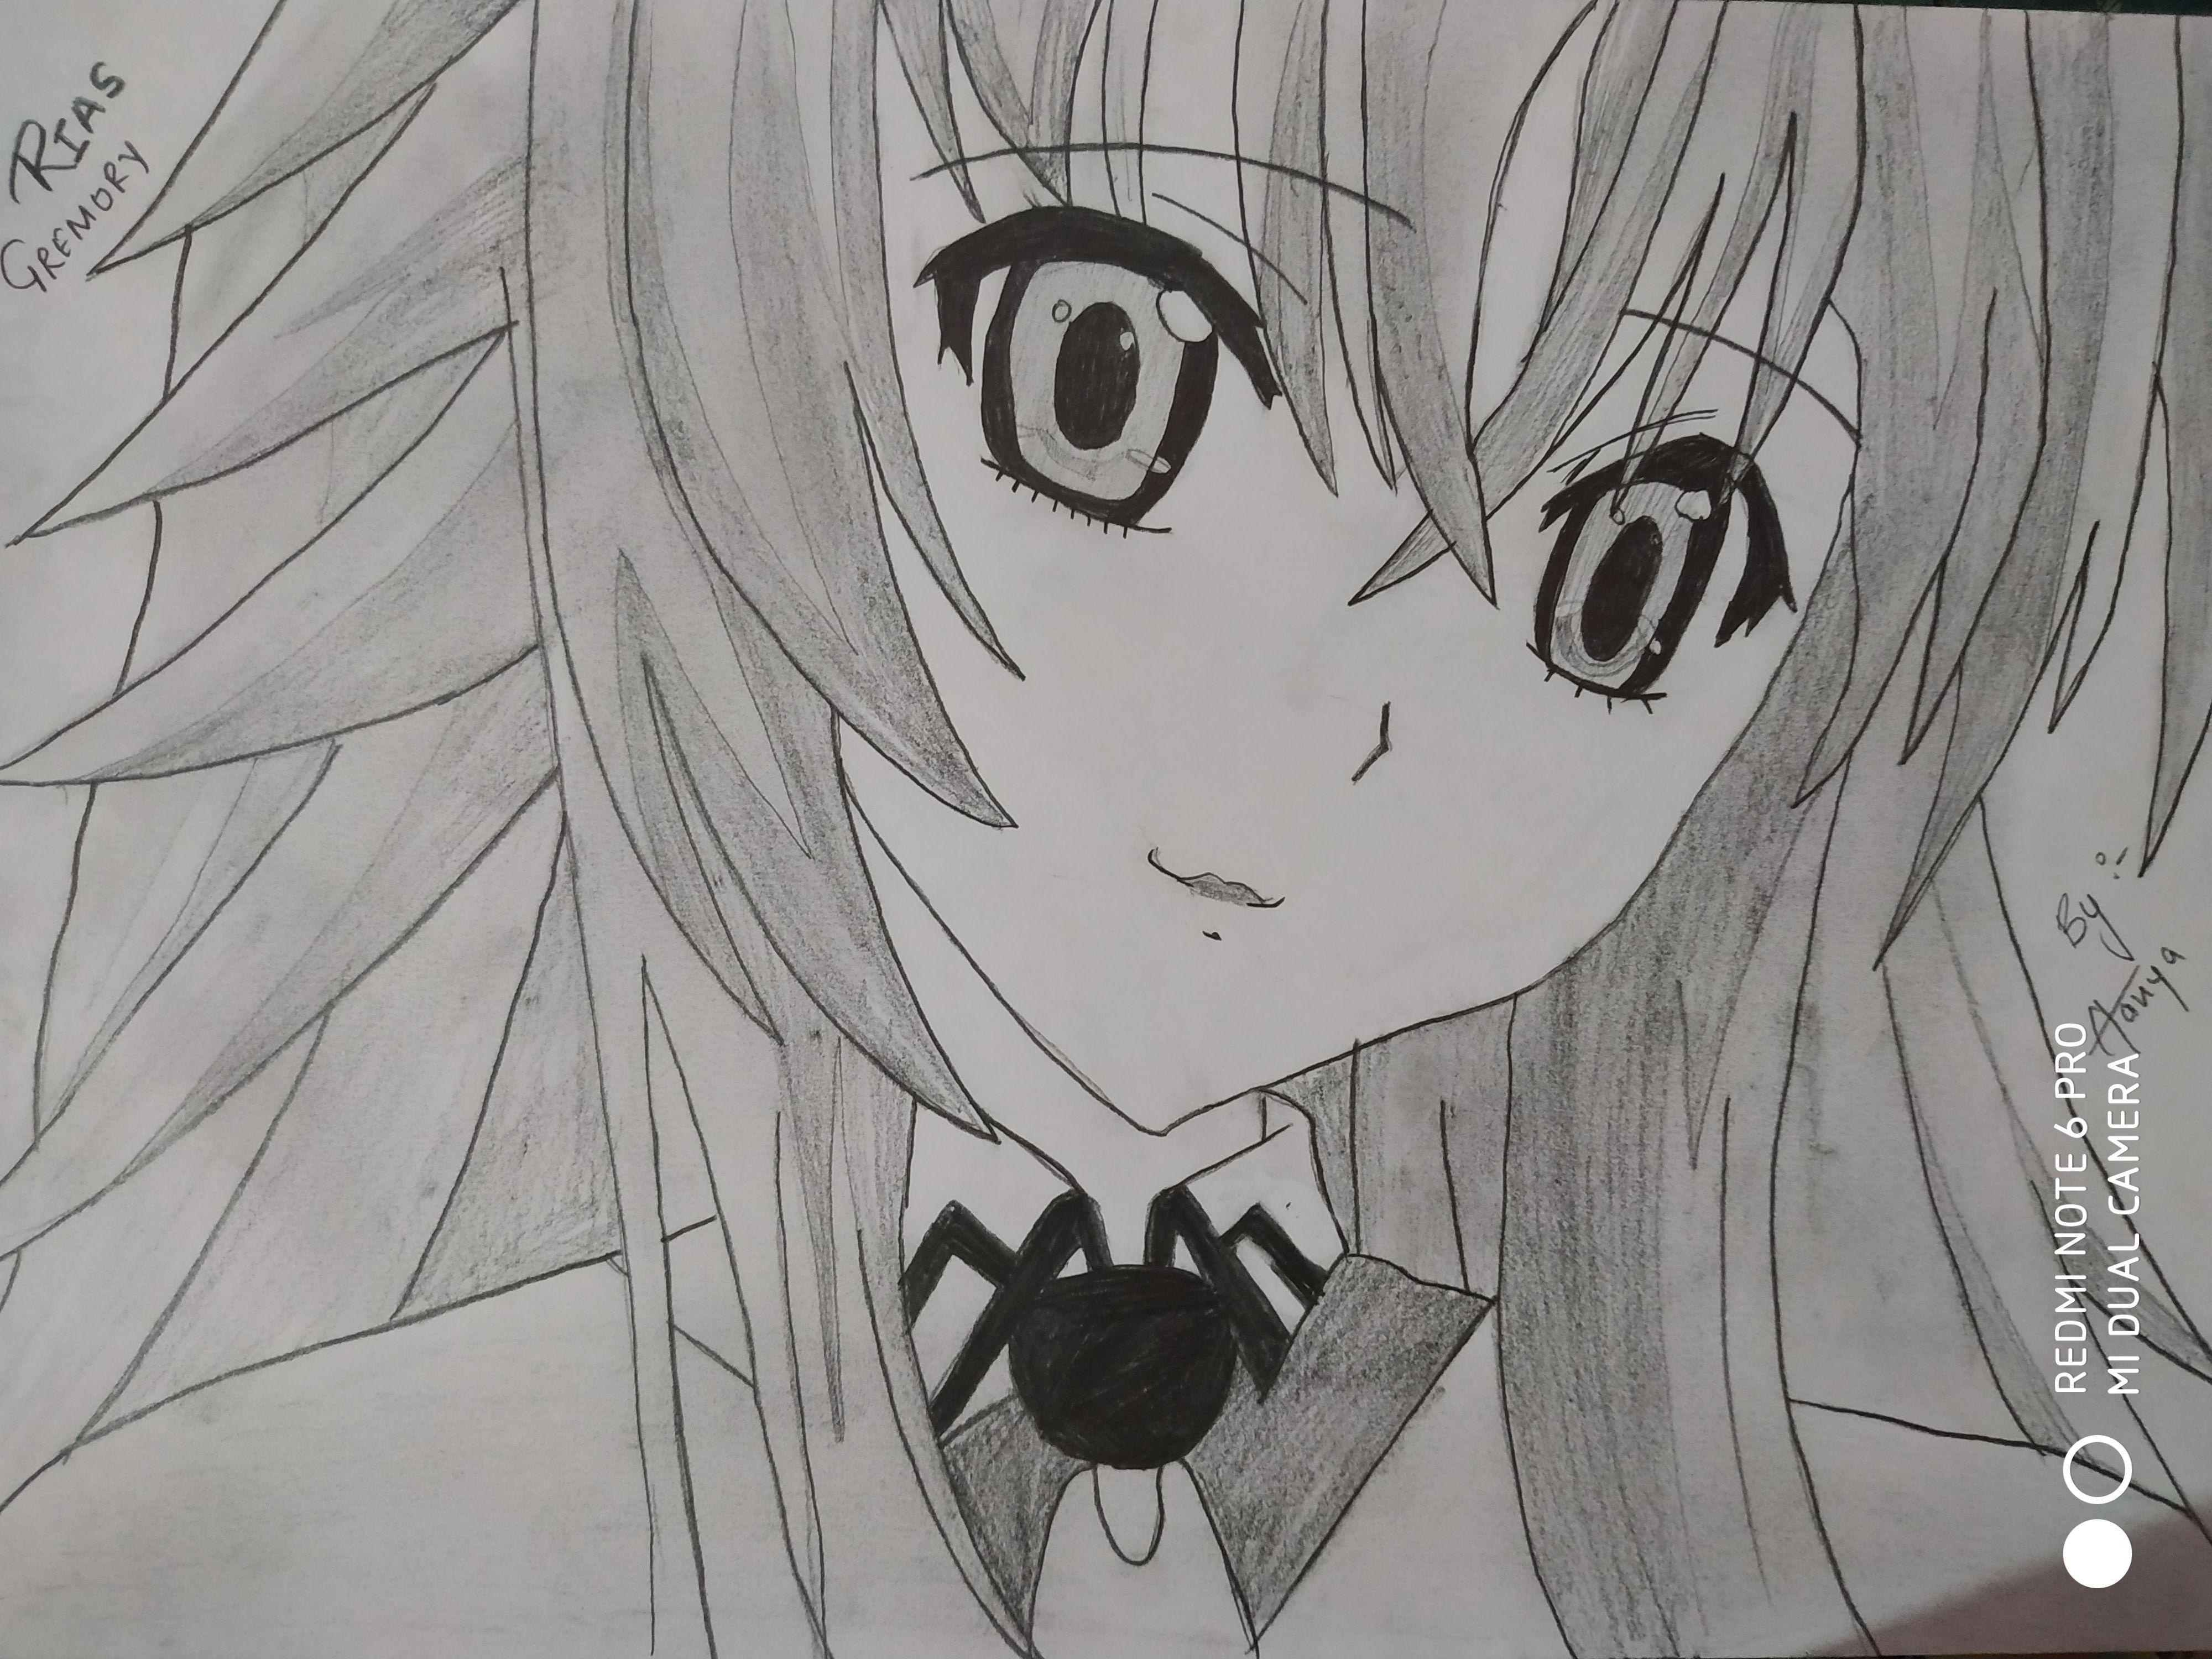 Rias Gremory Sketches, Art, Anime